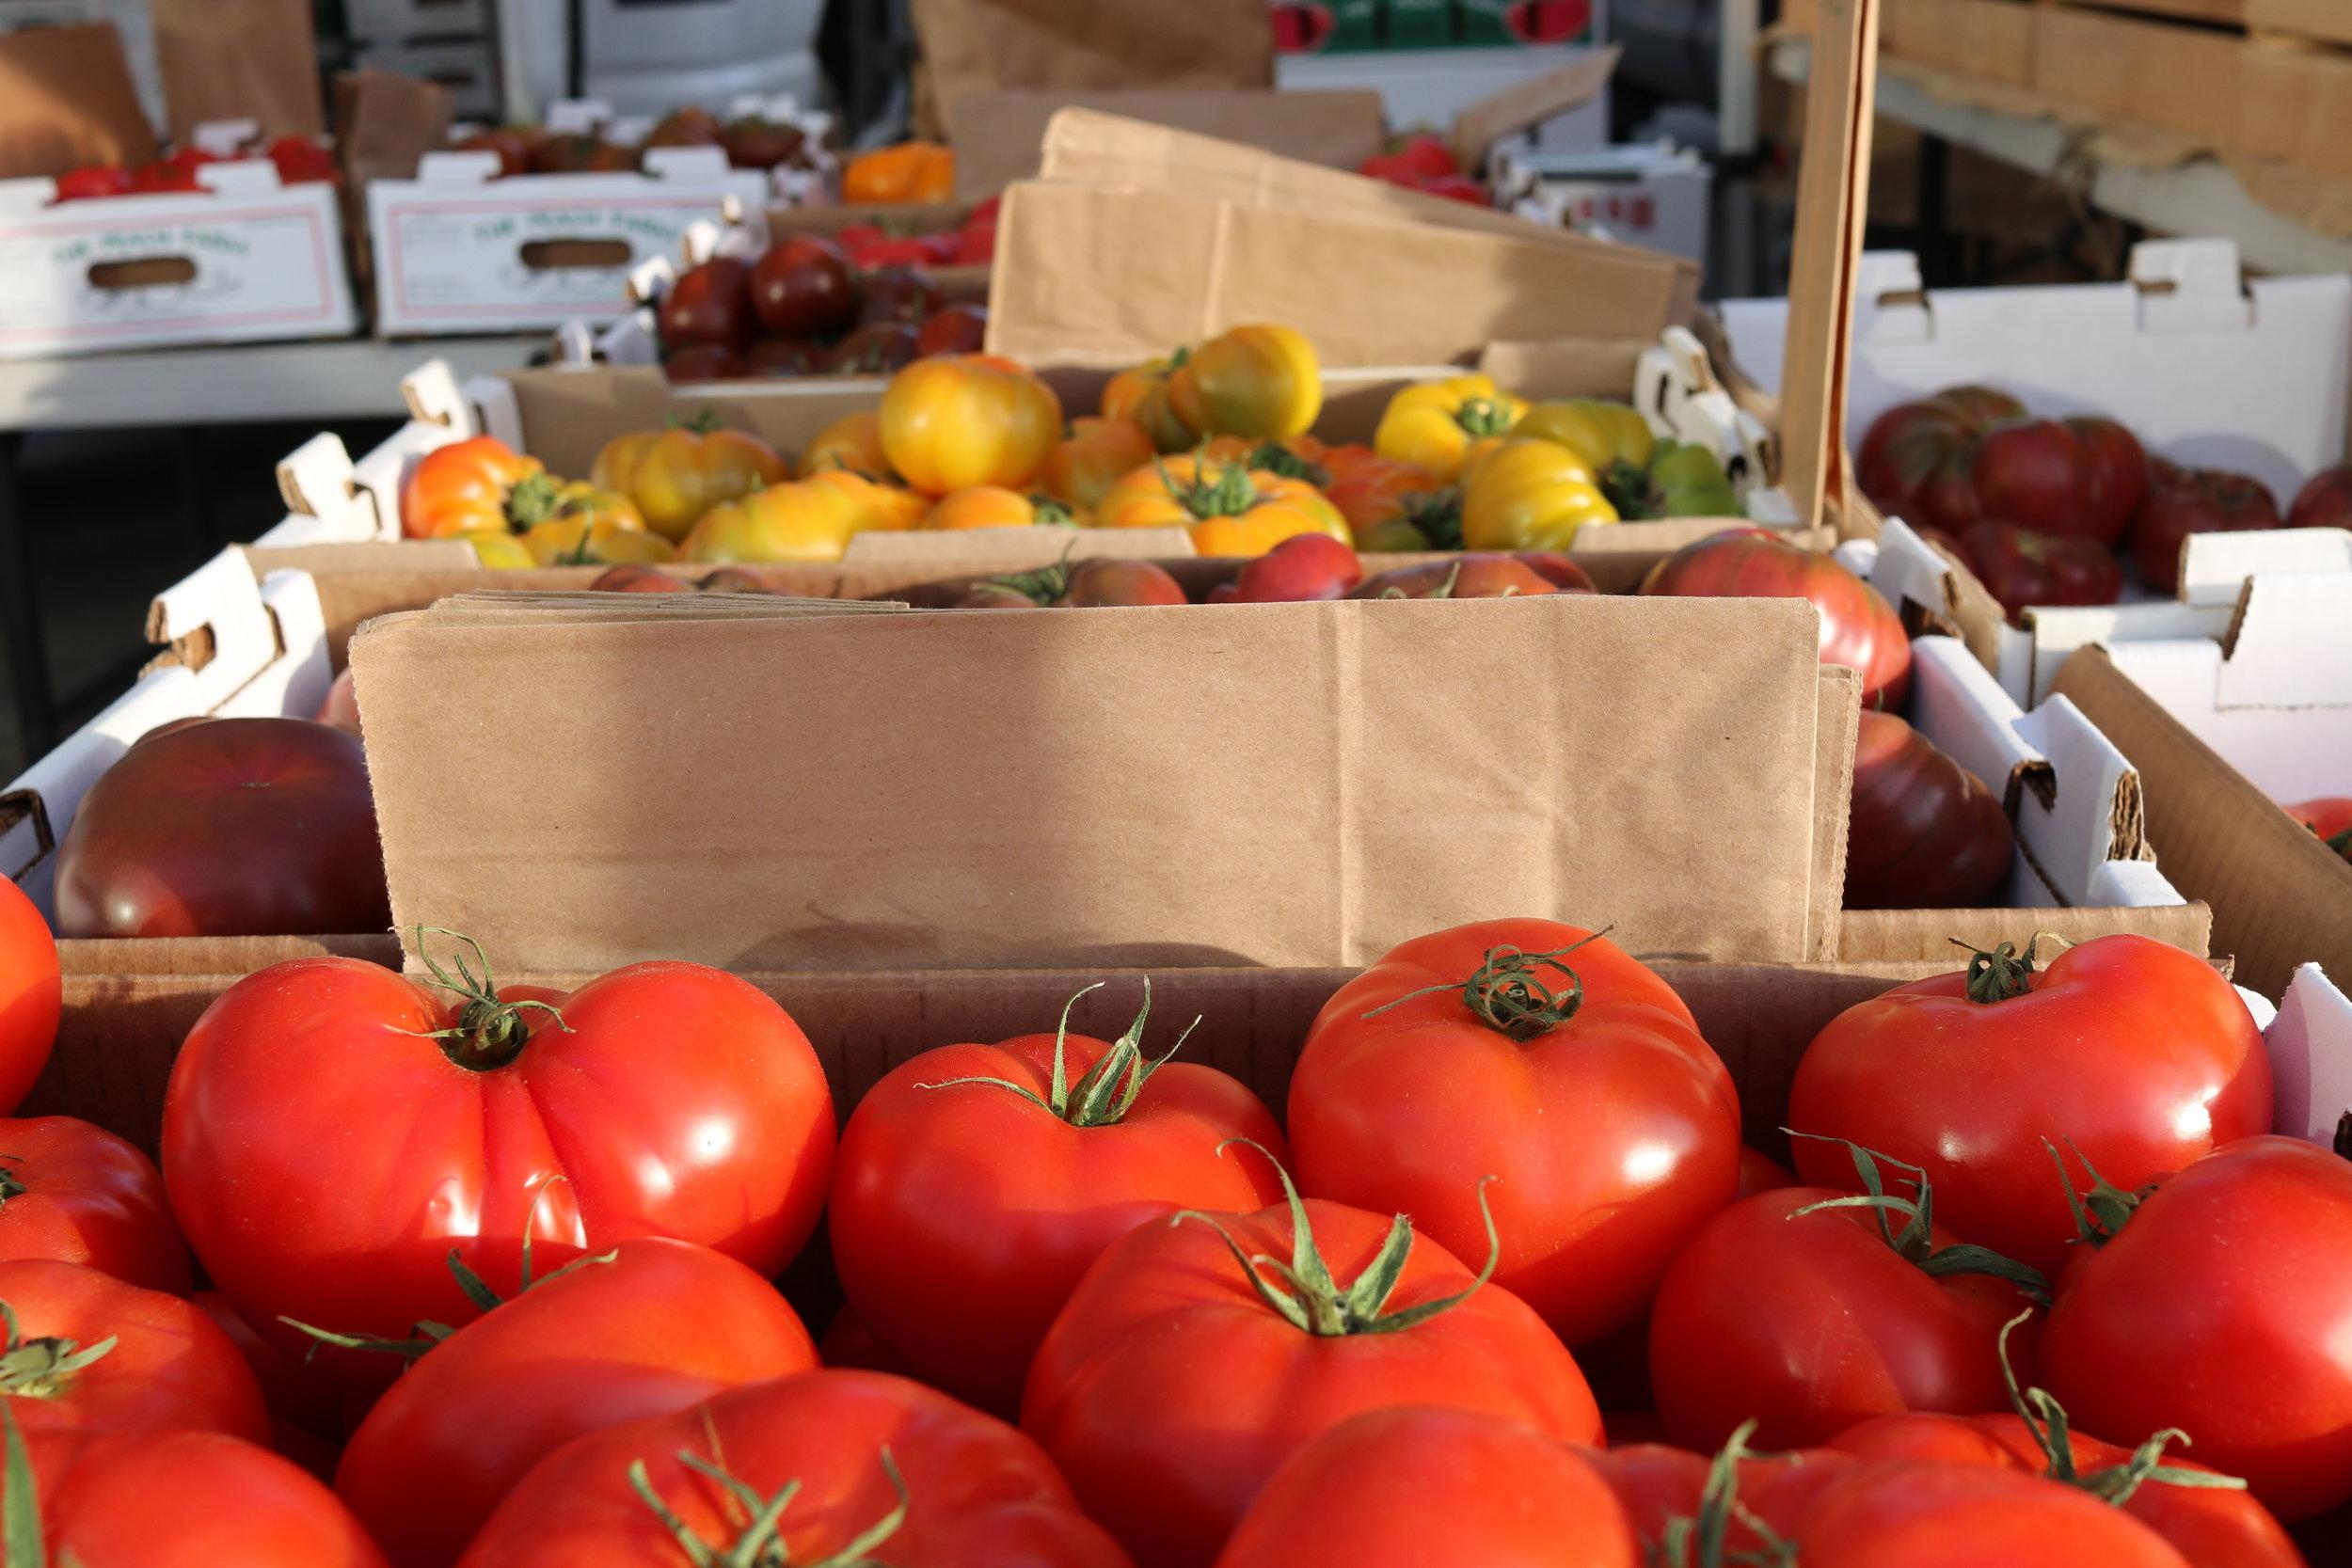 Tomatoes, San Francisco Ferry Building market, @acrosslandsea